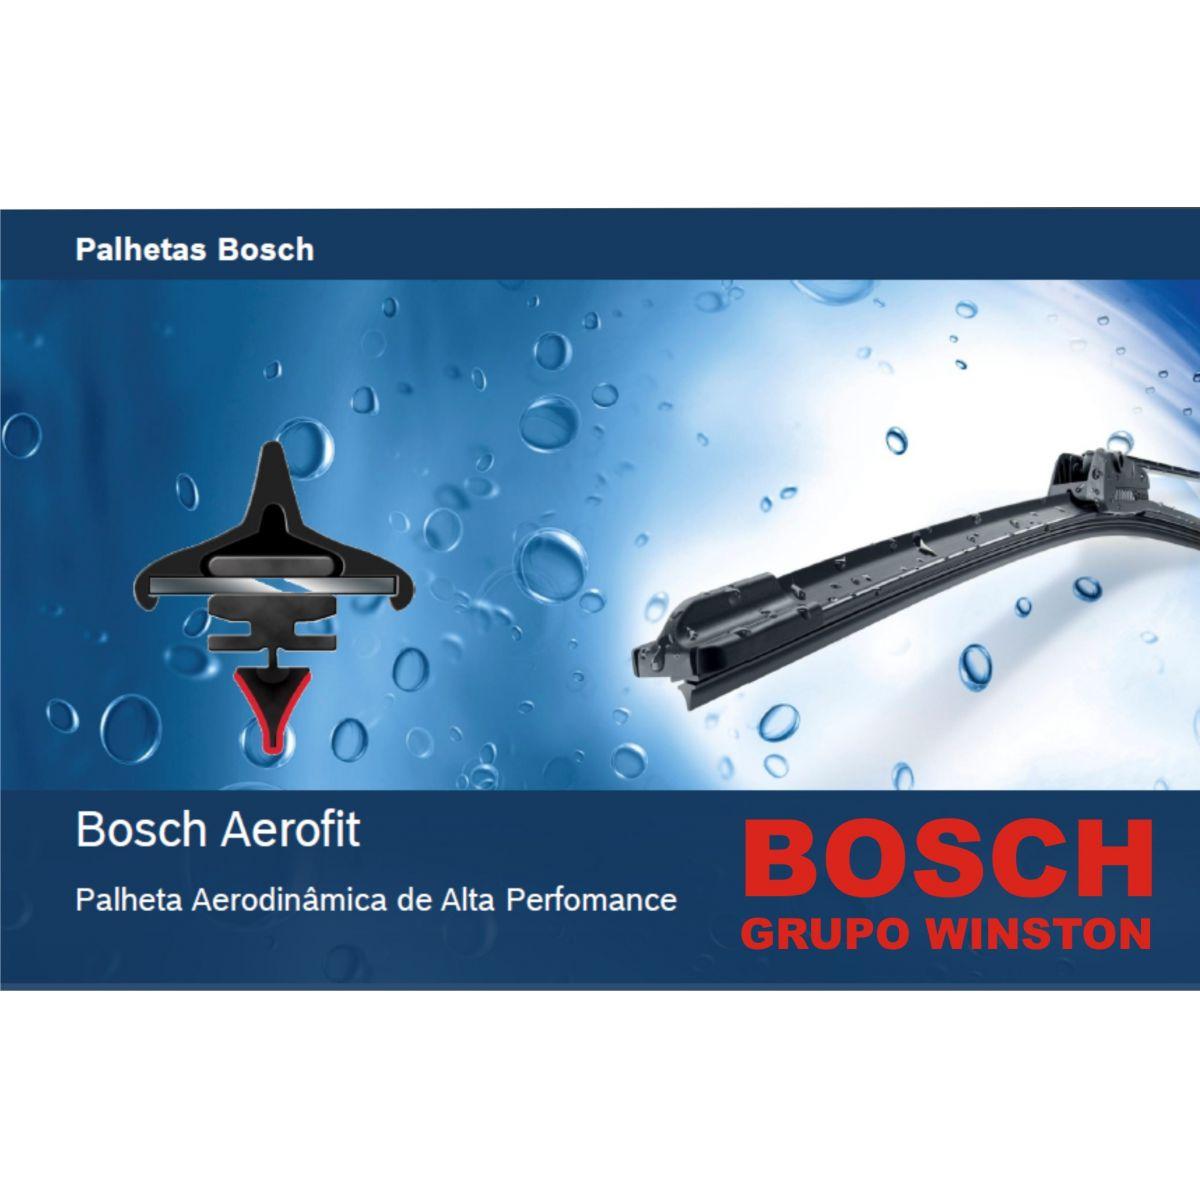 Palheta Bosch Aerofit Limpador de para brisa Bosch RENAULT Laguna II Laguna II Grand Tour